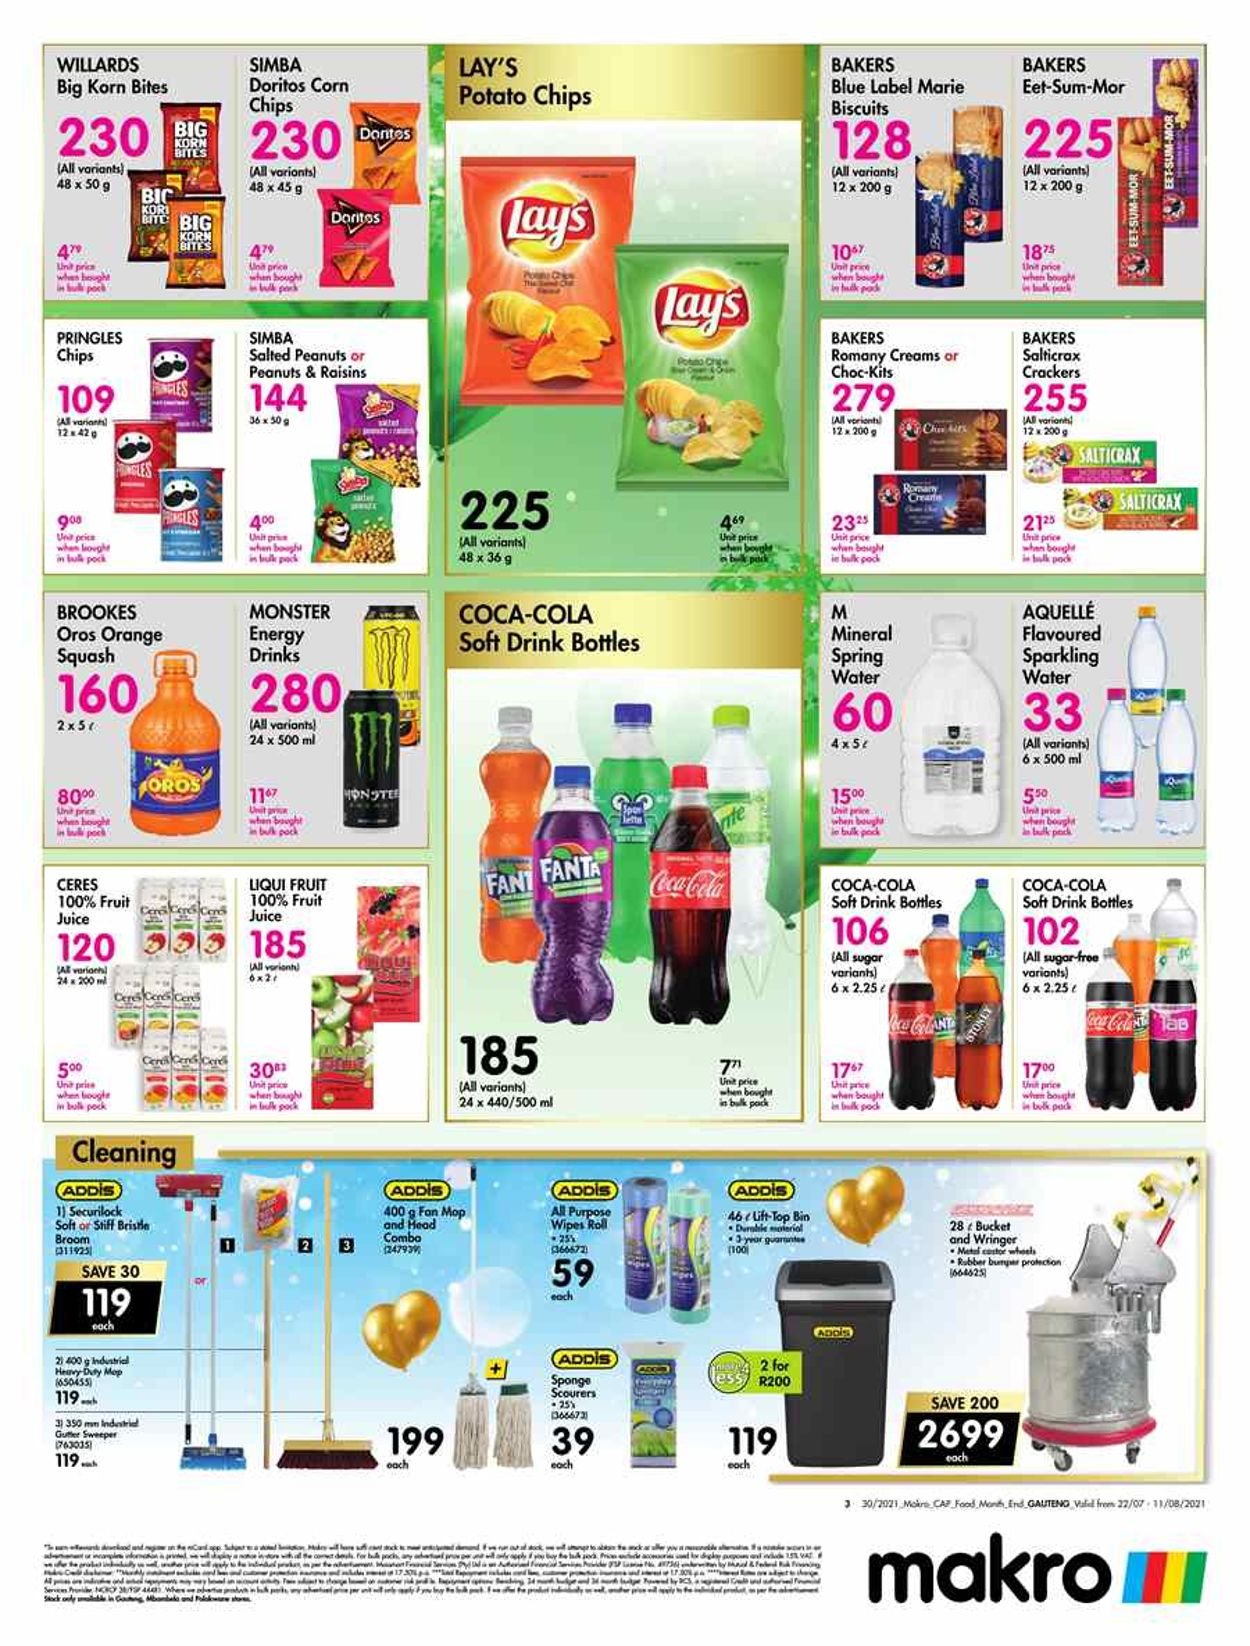 Makro Catalogue - 2021/07/22-2021/08/11 (Page 3)